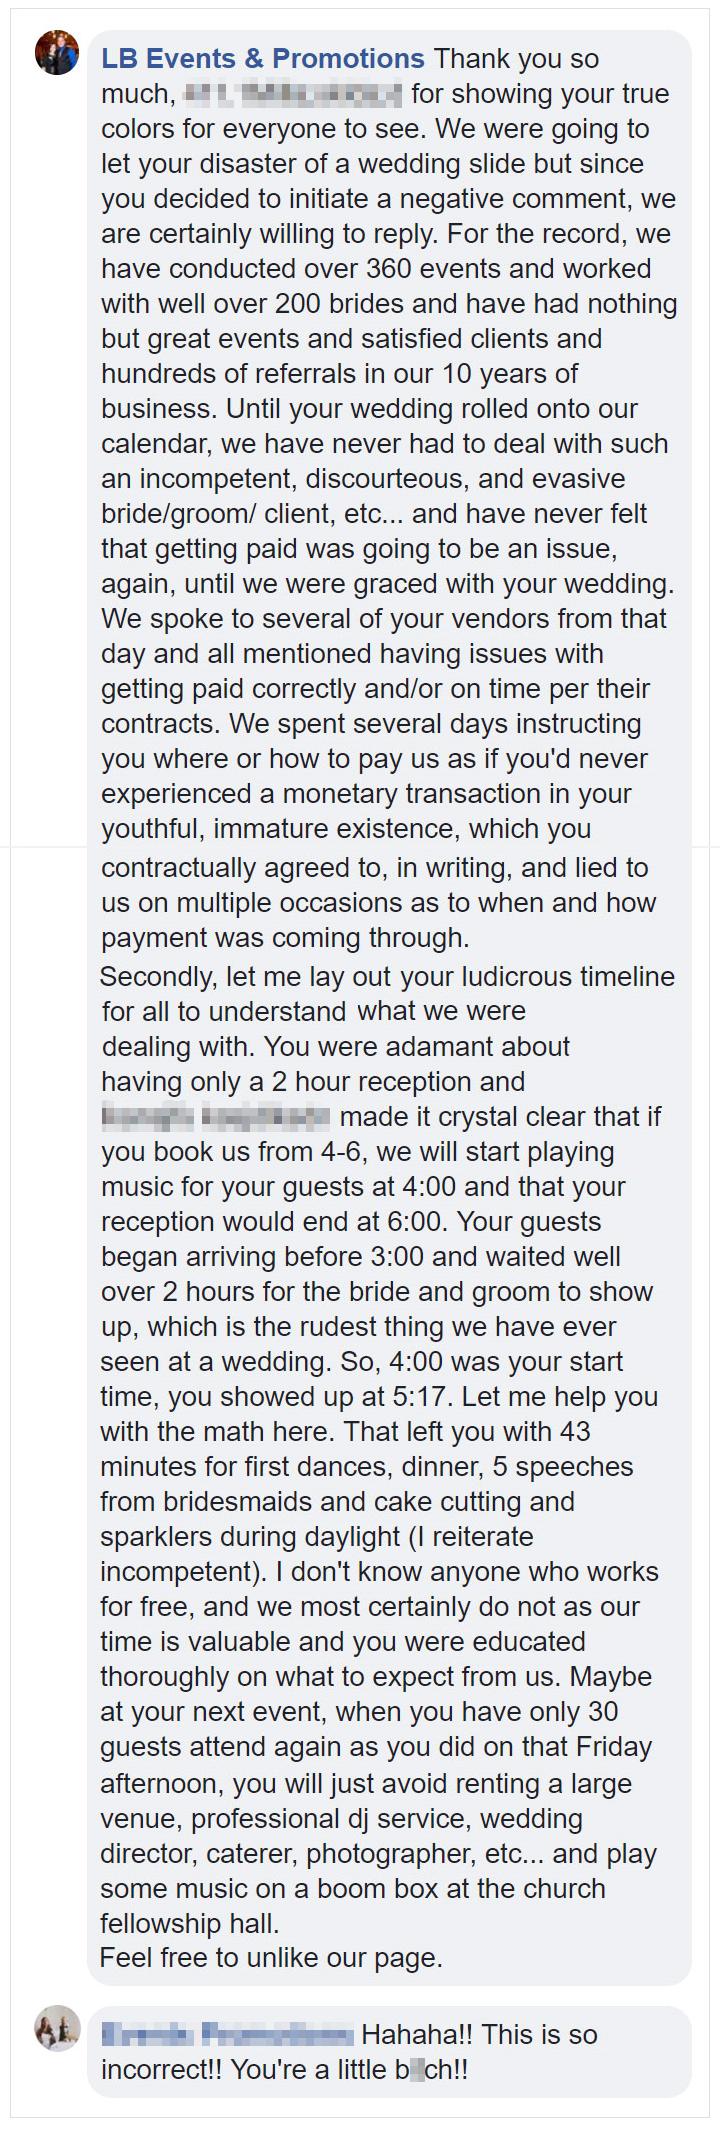 Dissatisfied Bride Gets Rude Wedding Planner Reply